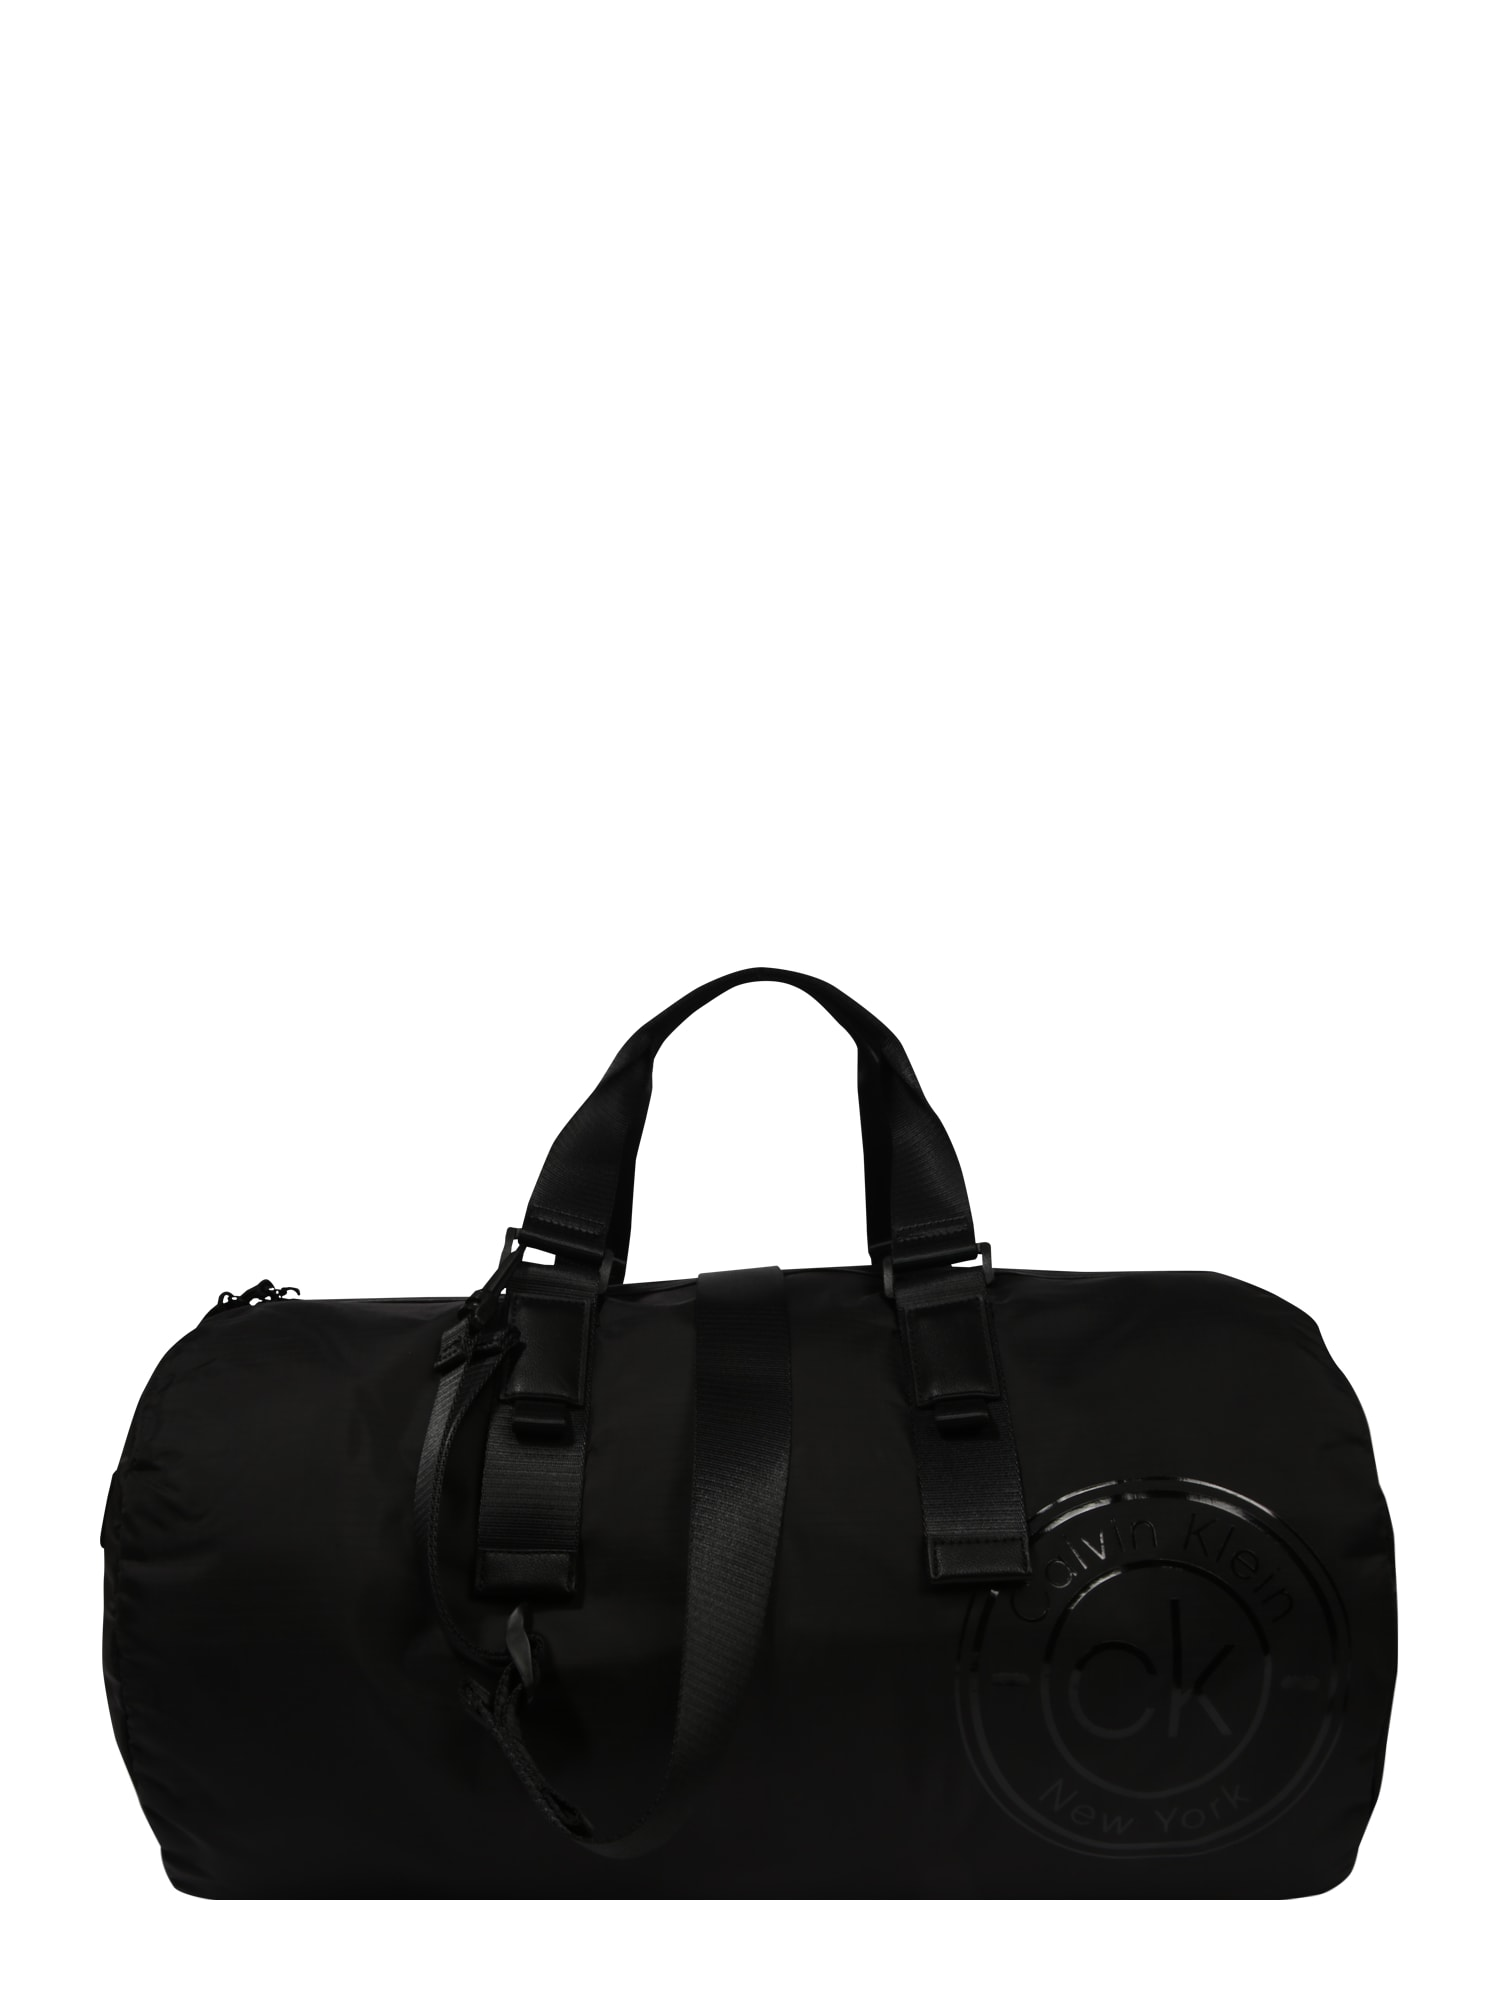 Calvin Klein Kelioninis krepšys 'AVAILED DUFFLE' juoda